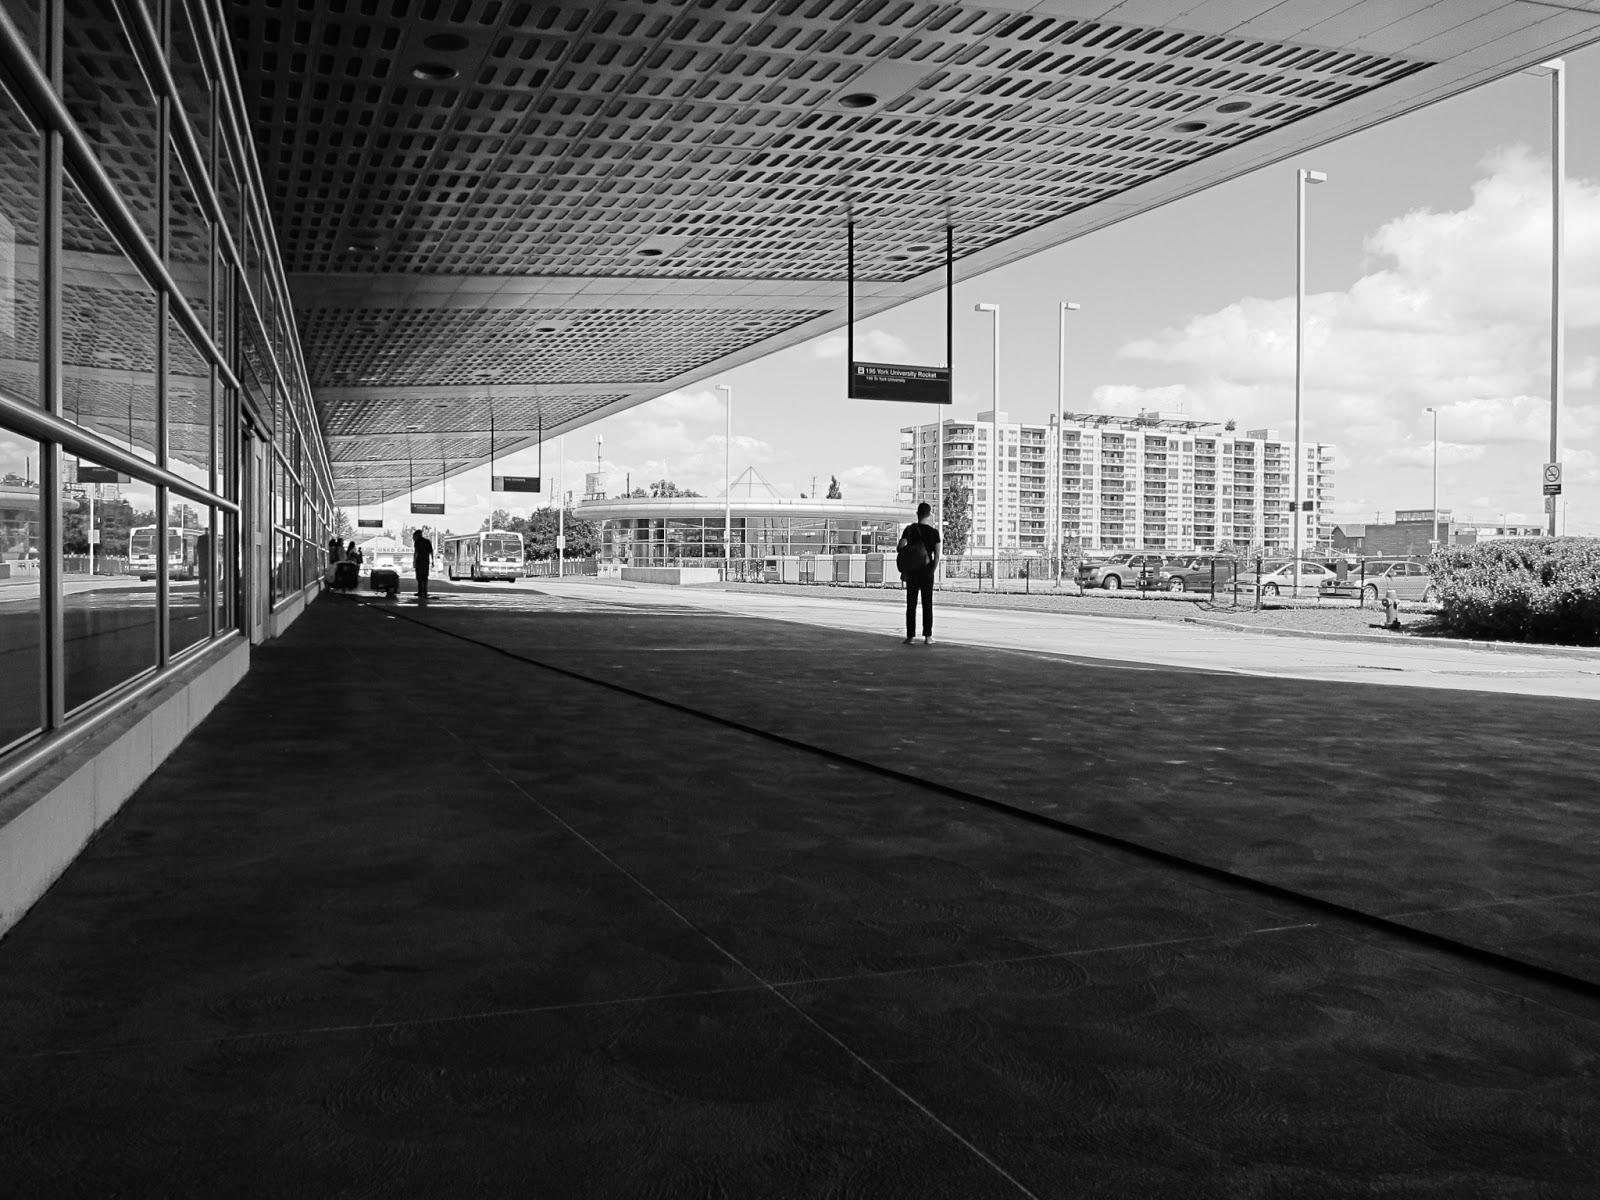 Photo: Bus platform, Downsview Station, Toronto